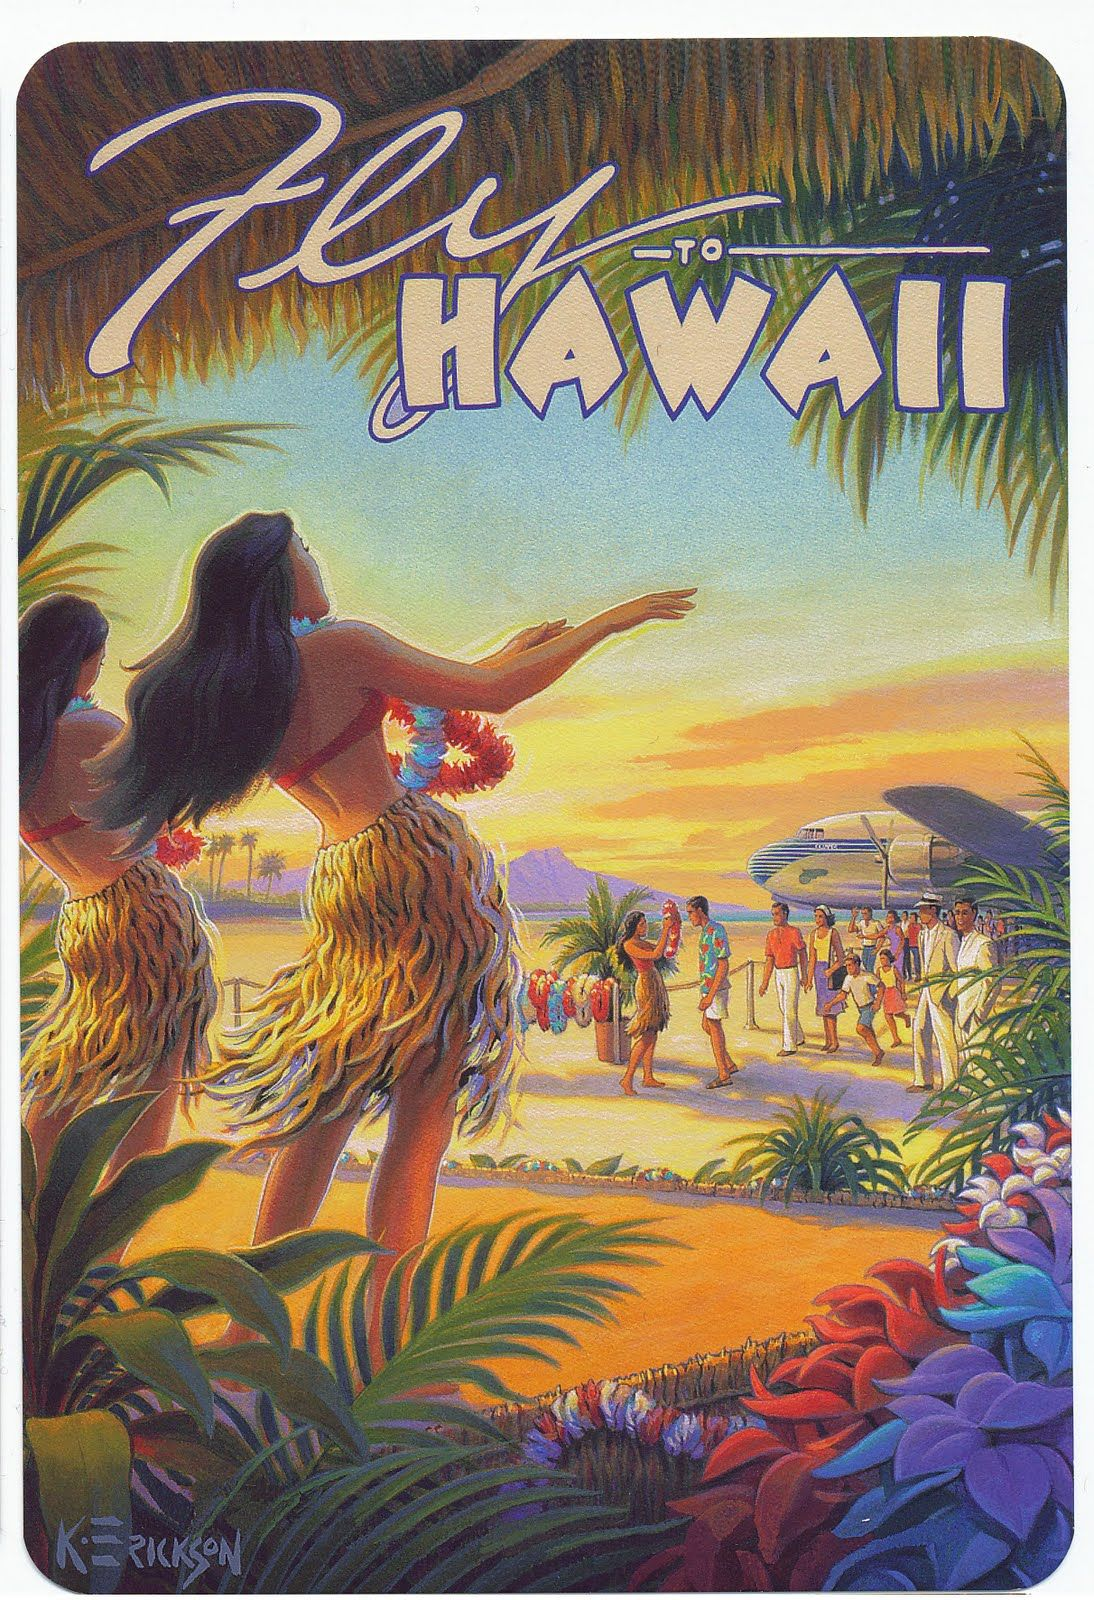 Mademoiselle B: Vintage Style Postcards from Hawaii